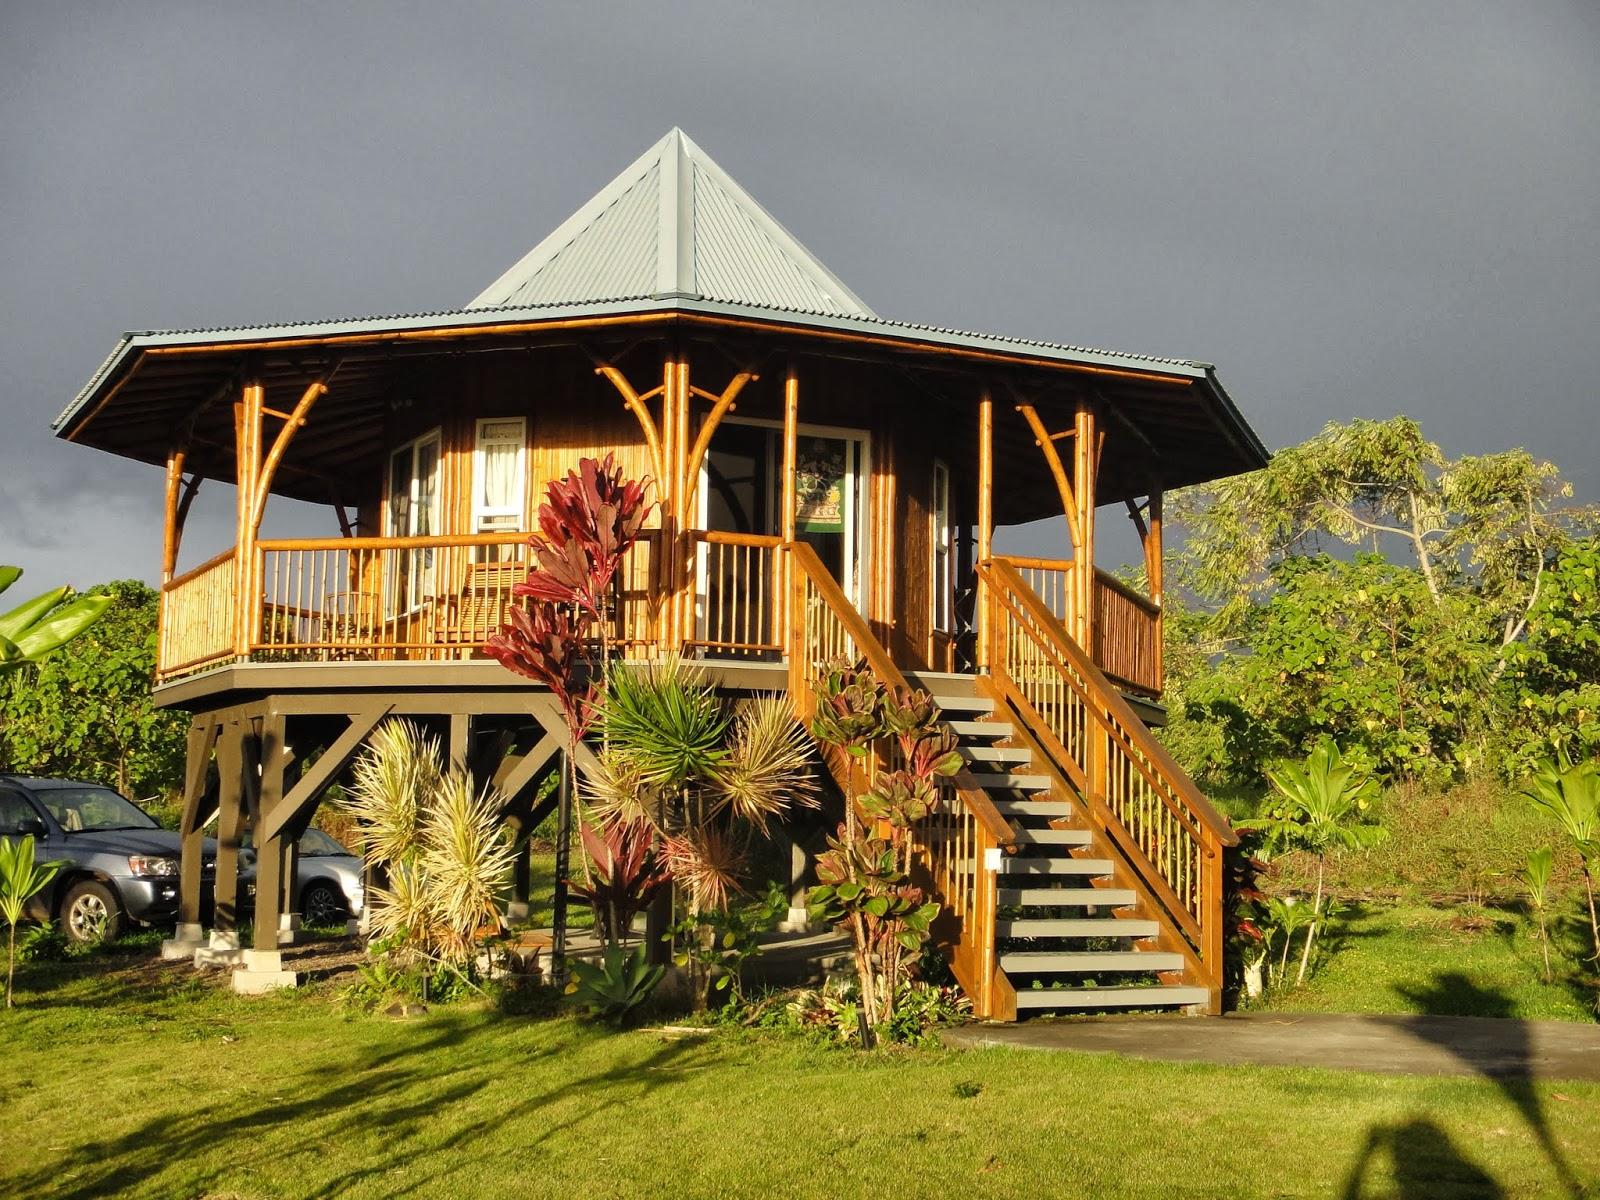 Halloween fairy garden ideas moreover small house plans in hawaii as